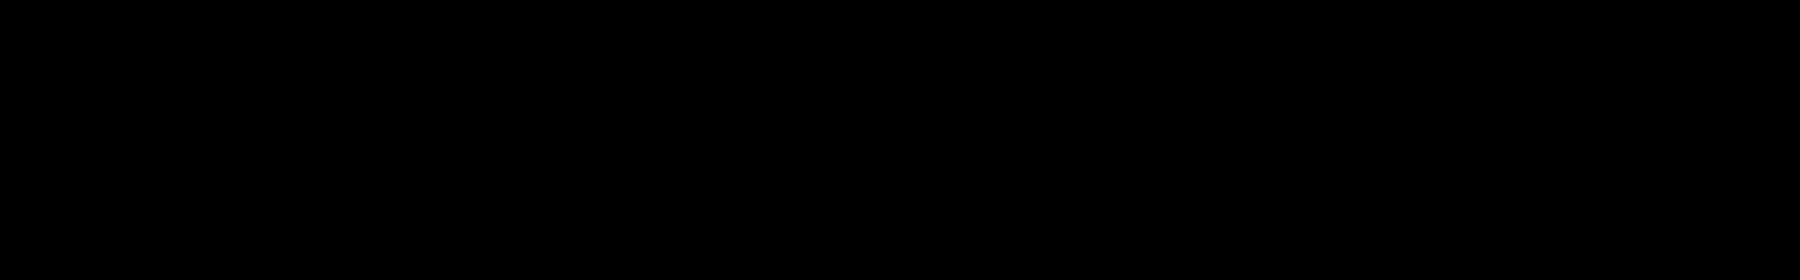 Skyline - Vocal Chops audio waveform